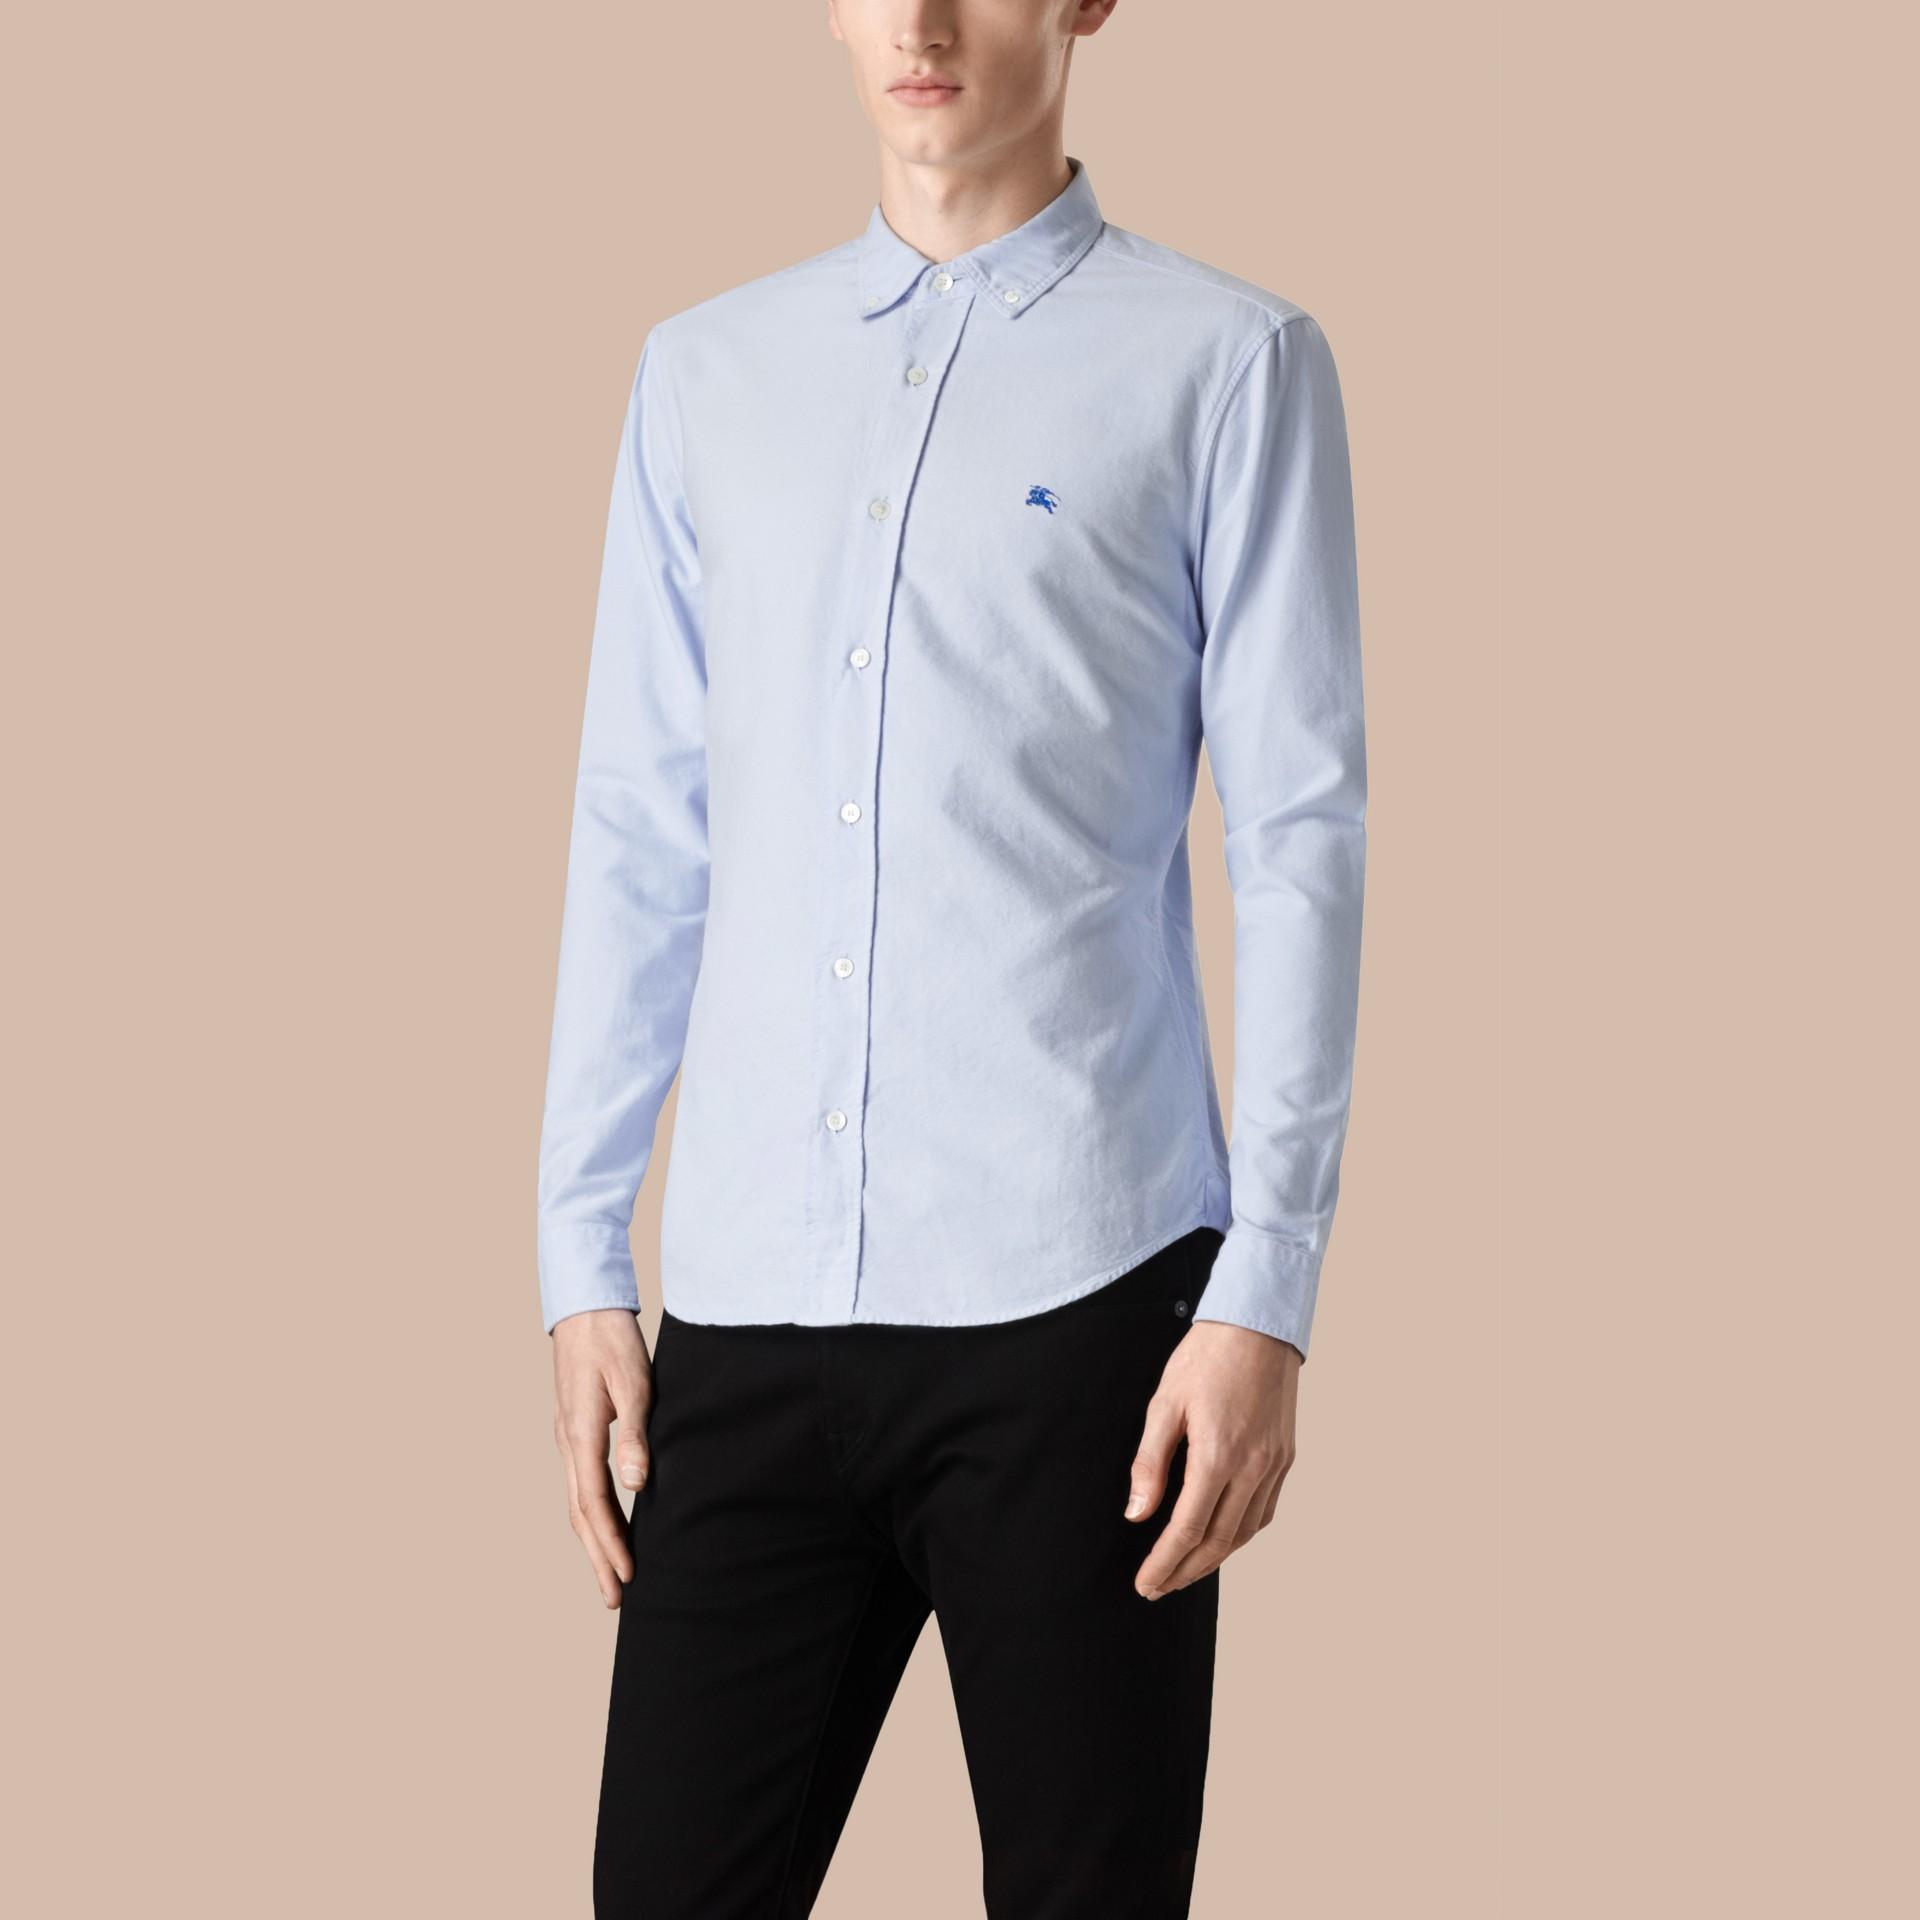 Hellblau Oxford-Hemd aus Baumwolle Hellblau - Galerie-Bild 4